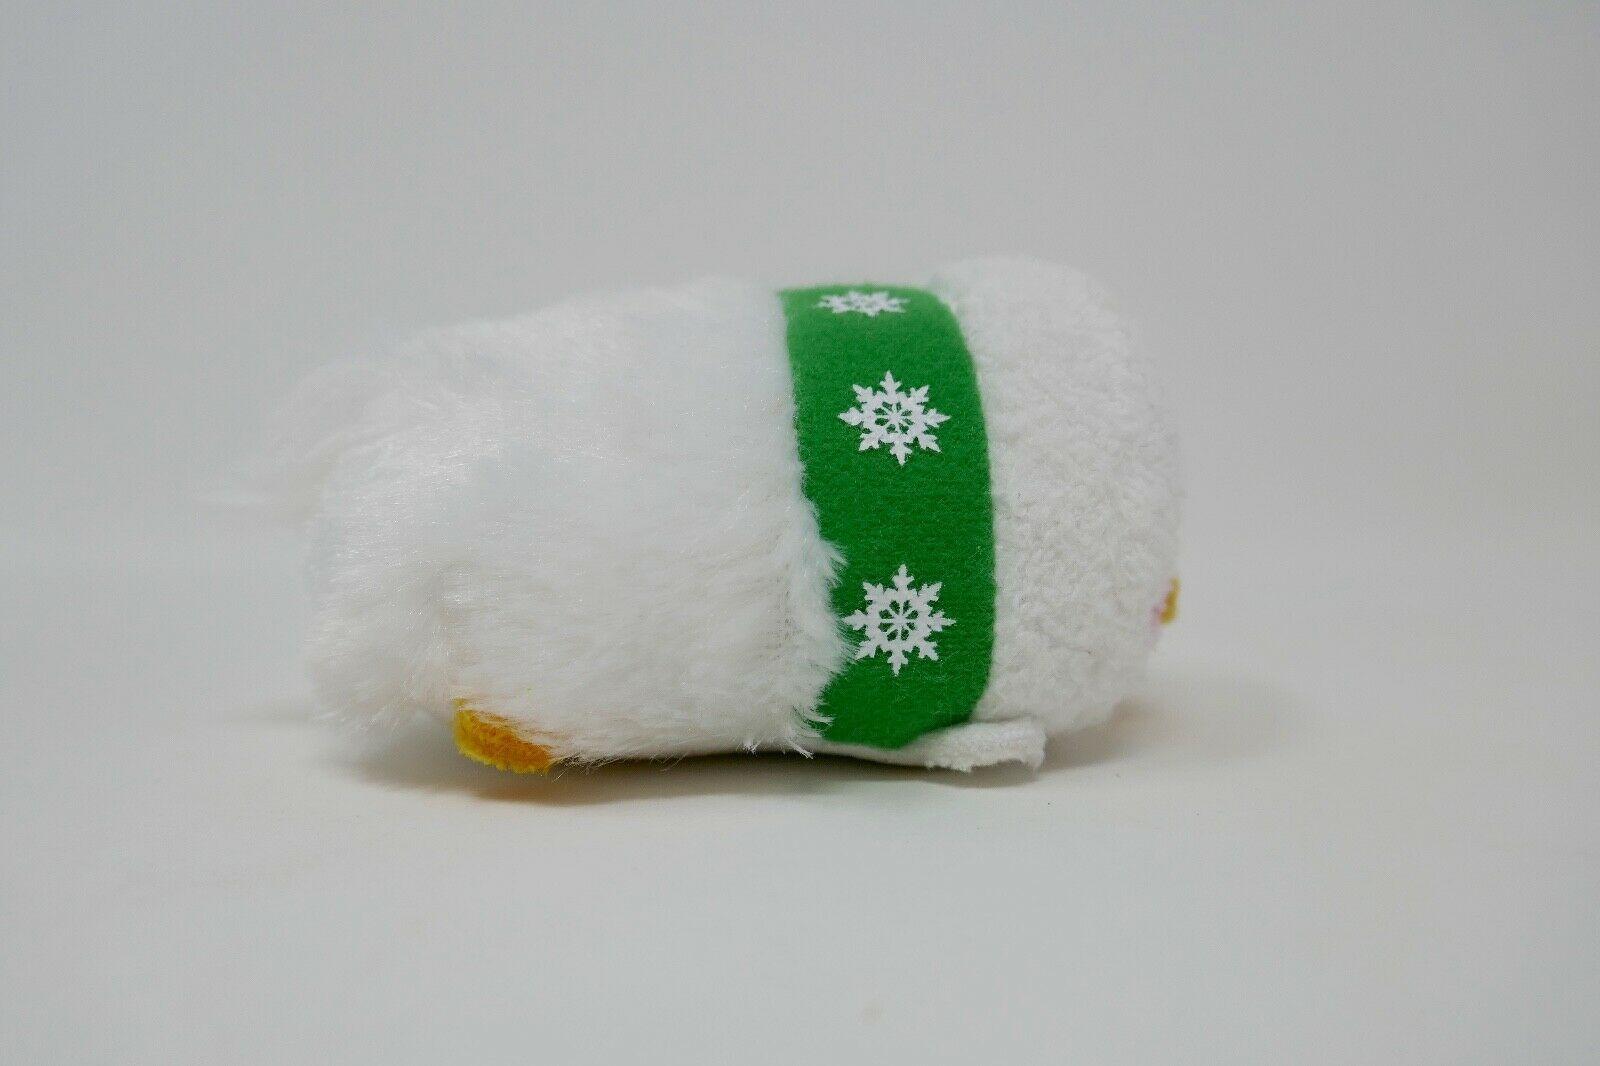 "Disney Store Tsum Tsum 3"" Plush Stuffed Animal - Snowman Donald Duck"